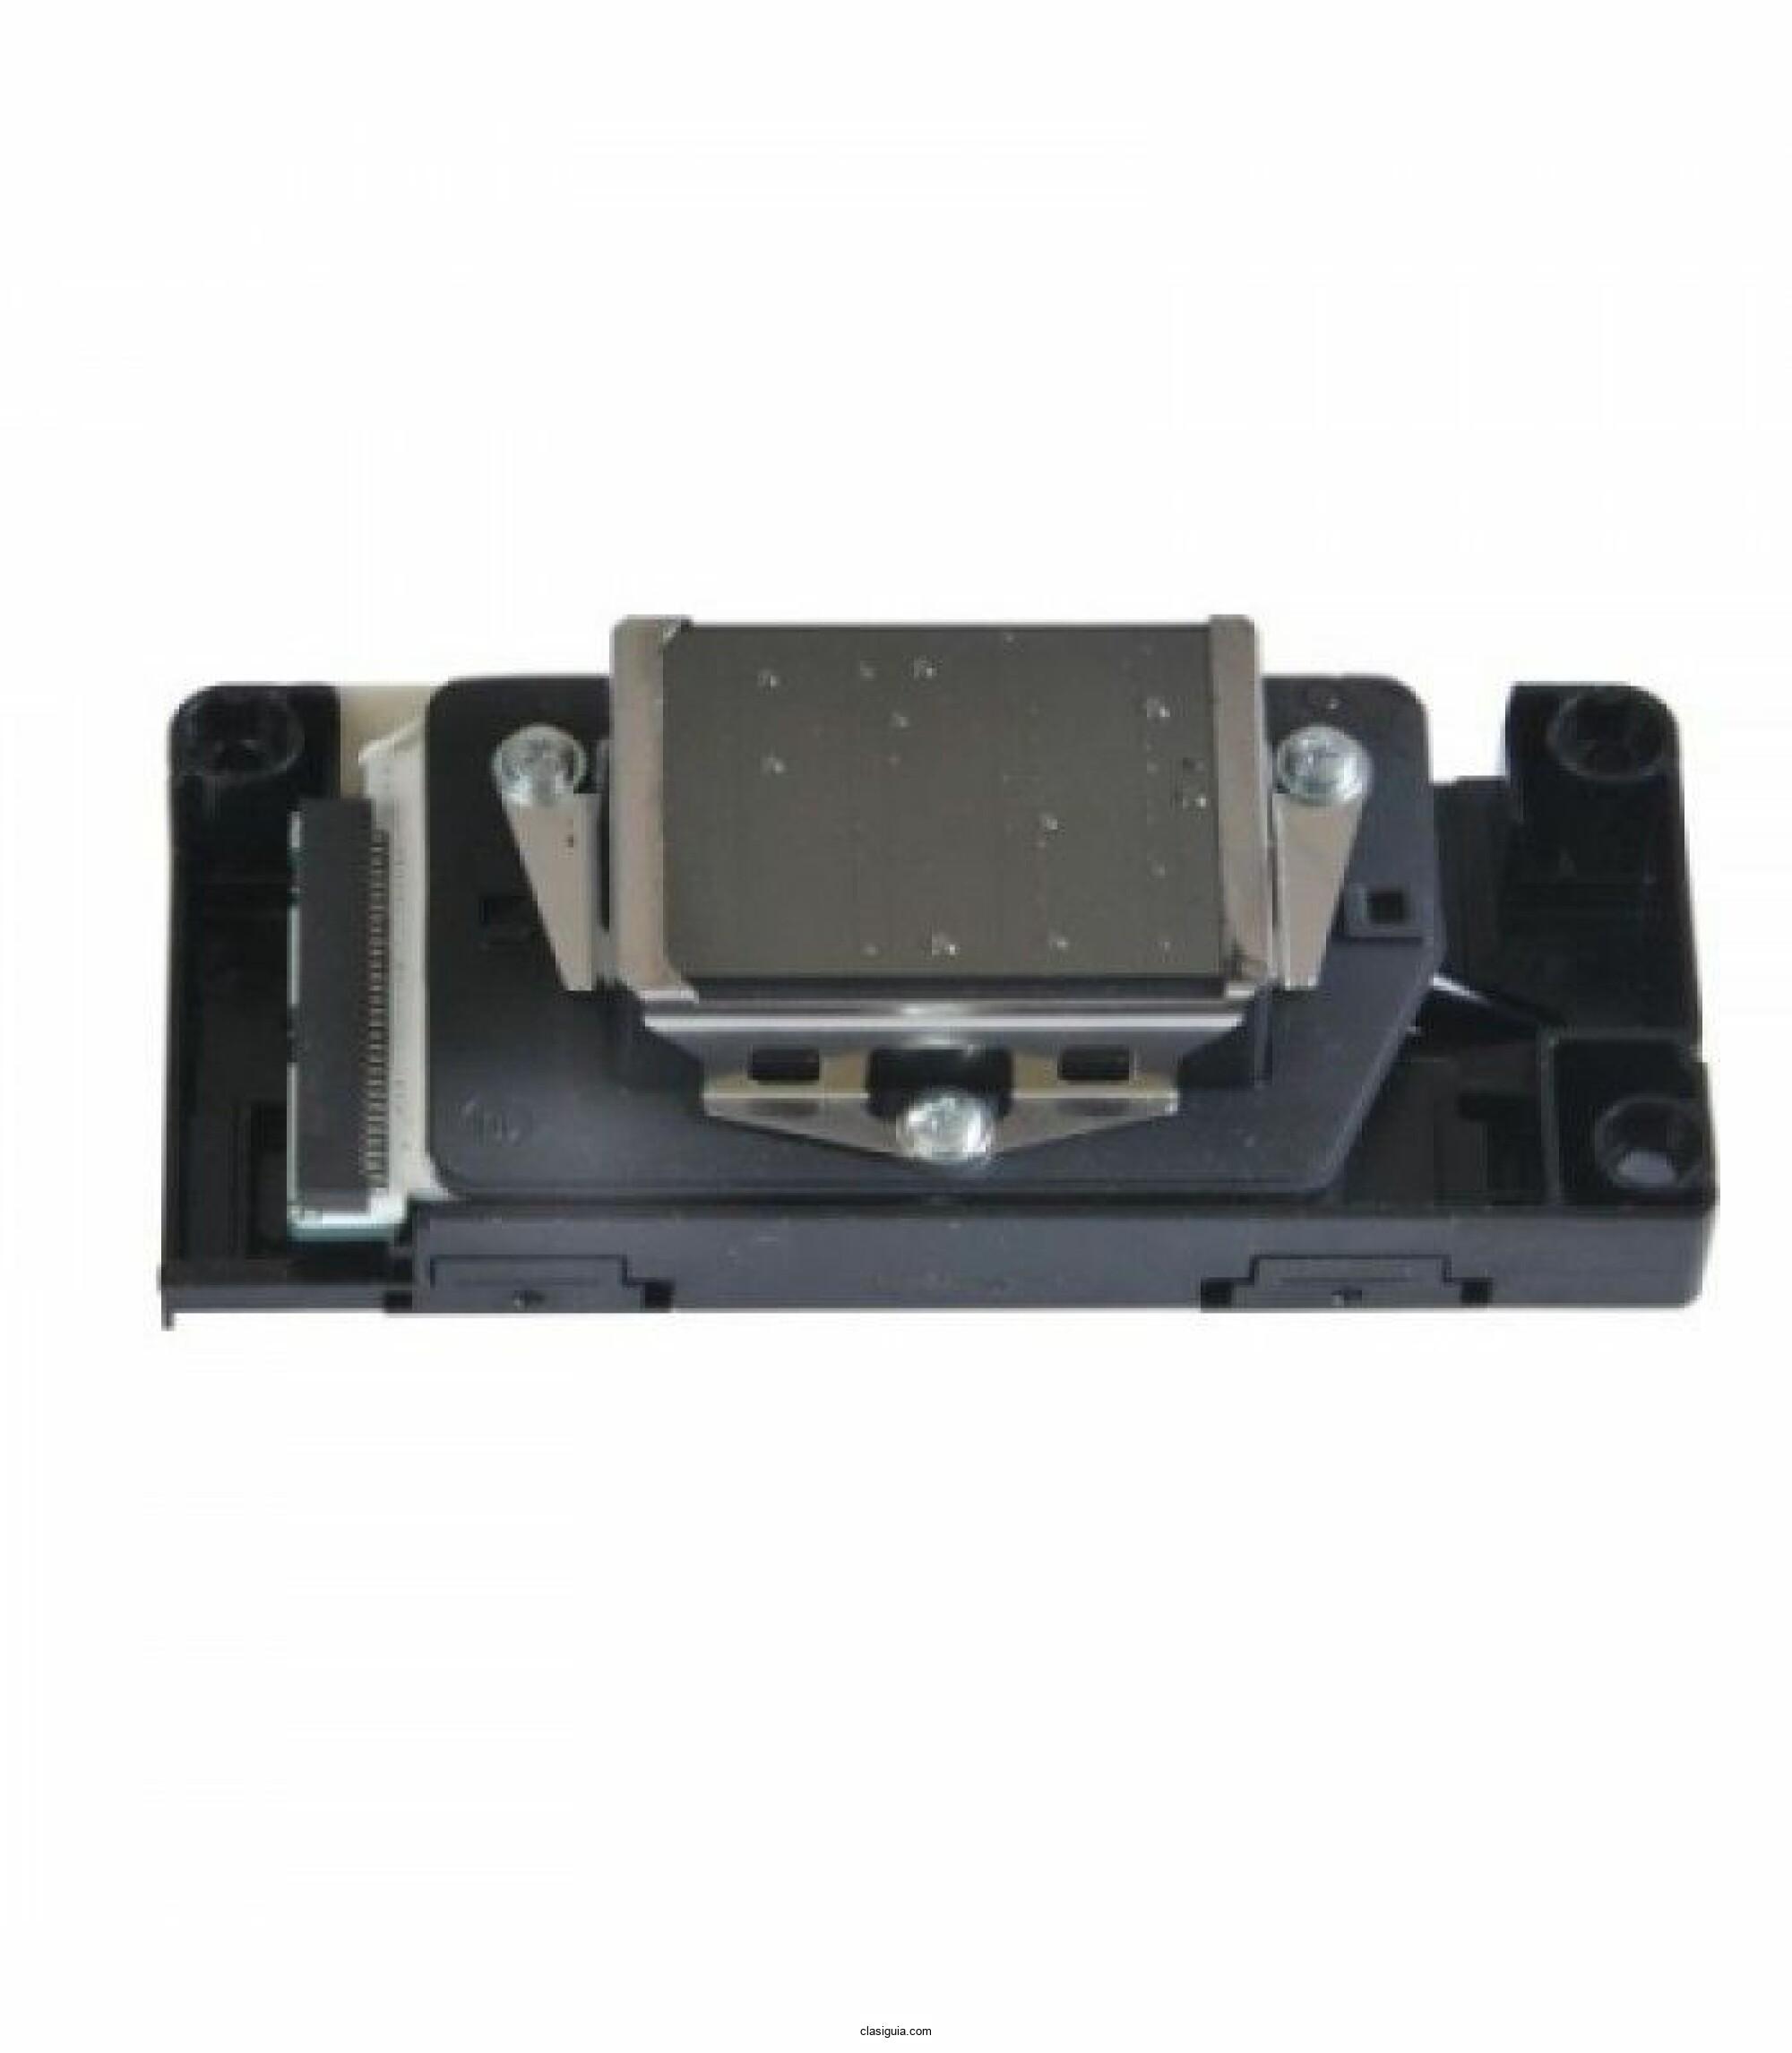 Epson R1800 Printhead (DX5) - F158000 / F158010 (ASOKA PRINTING)